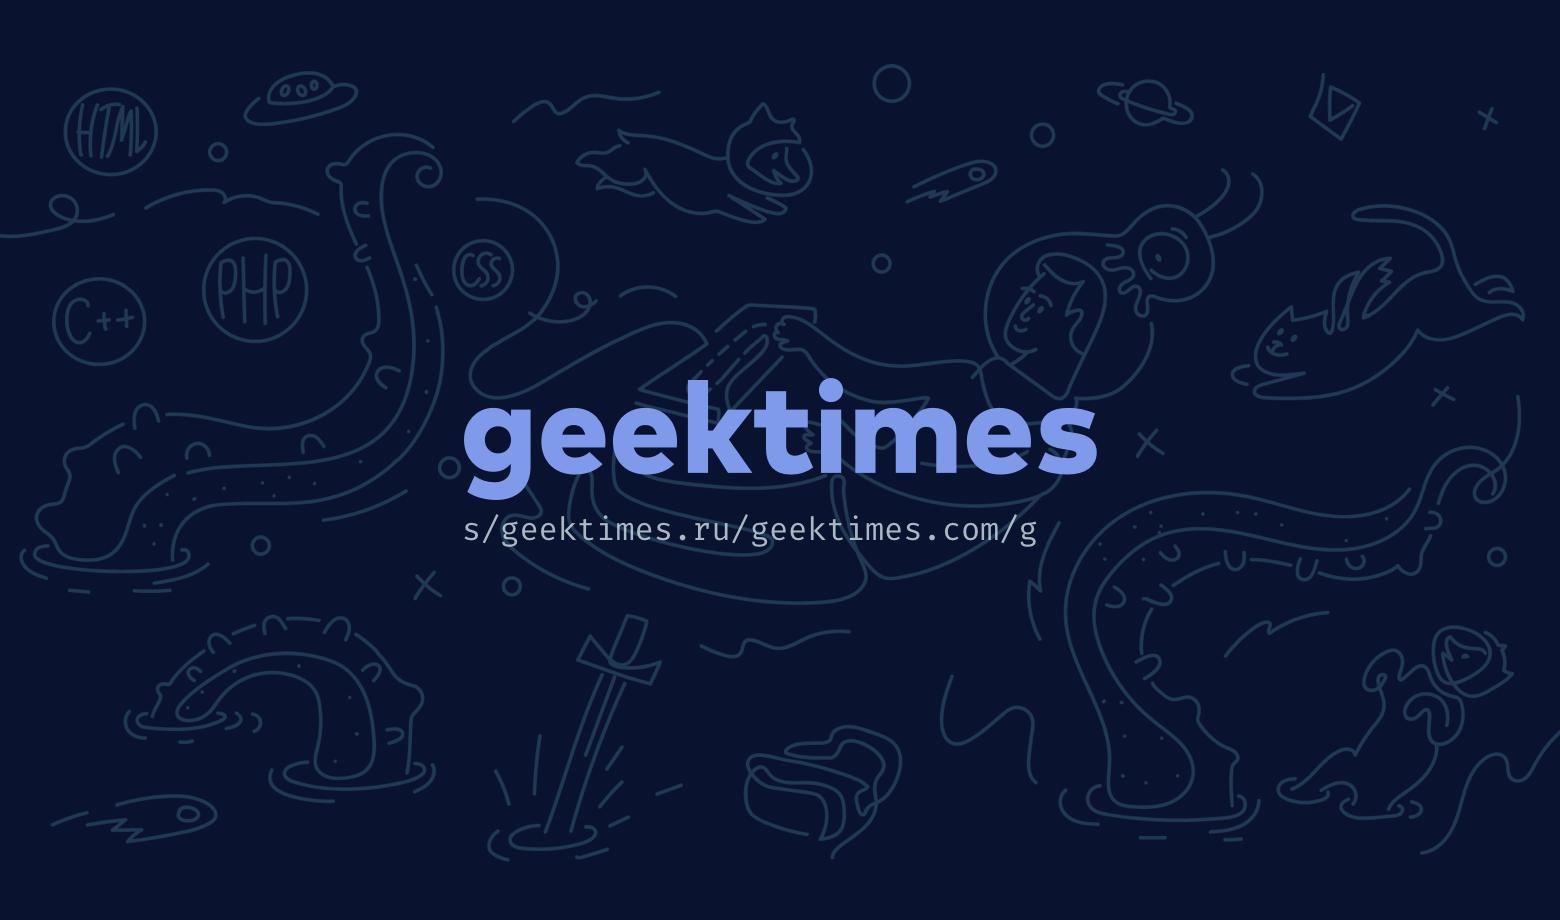 geektimes.ru → geektimes.com - 1